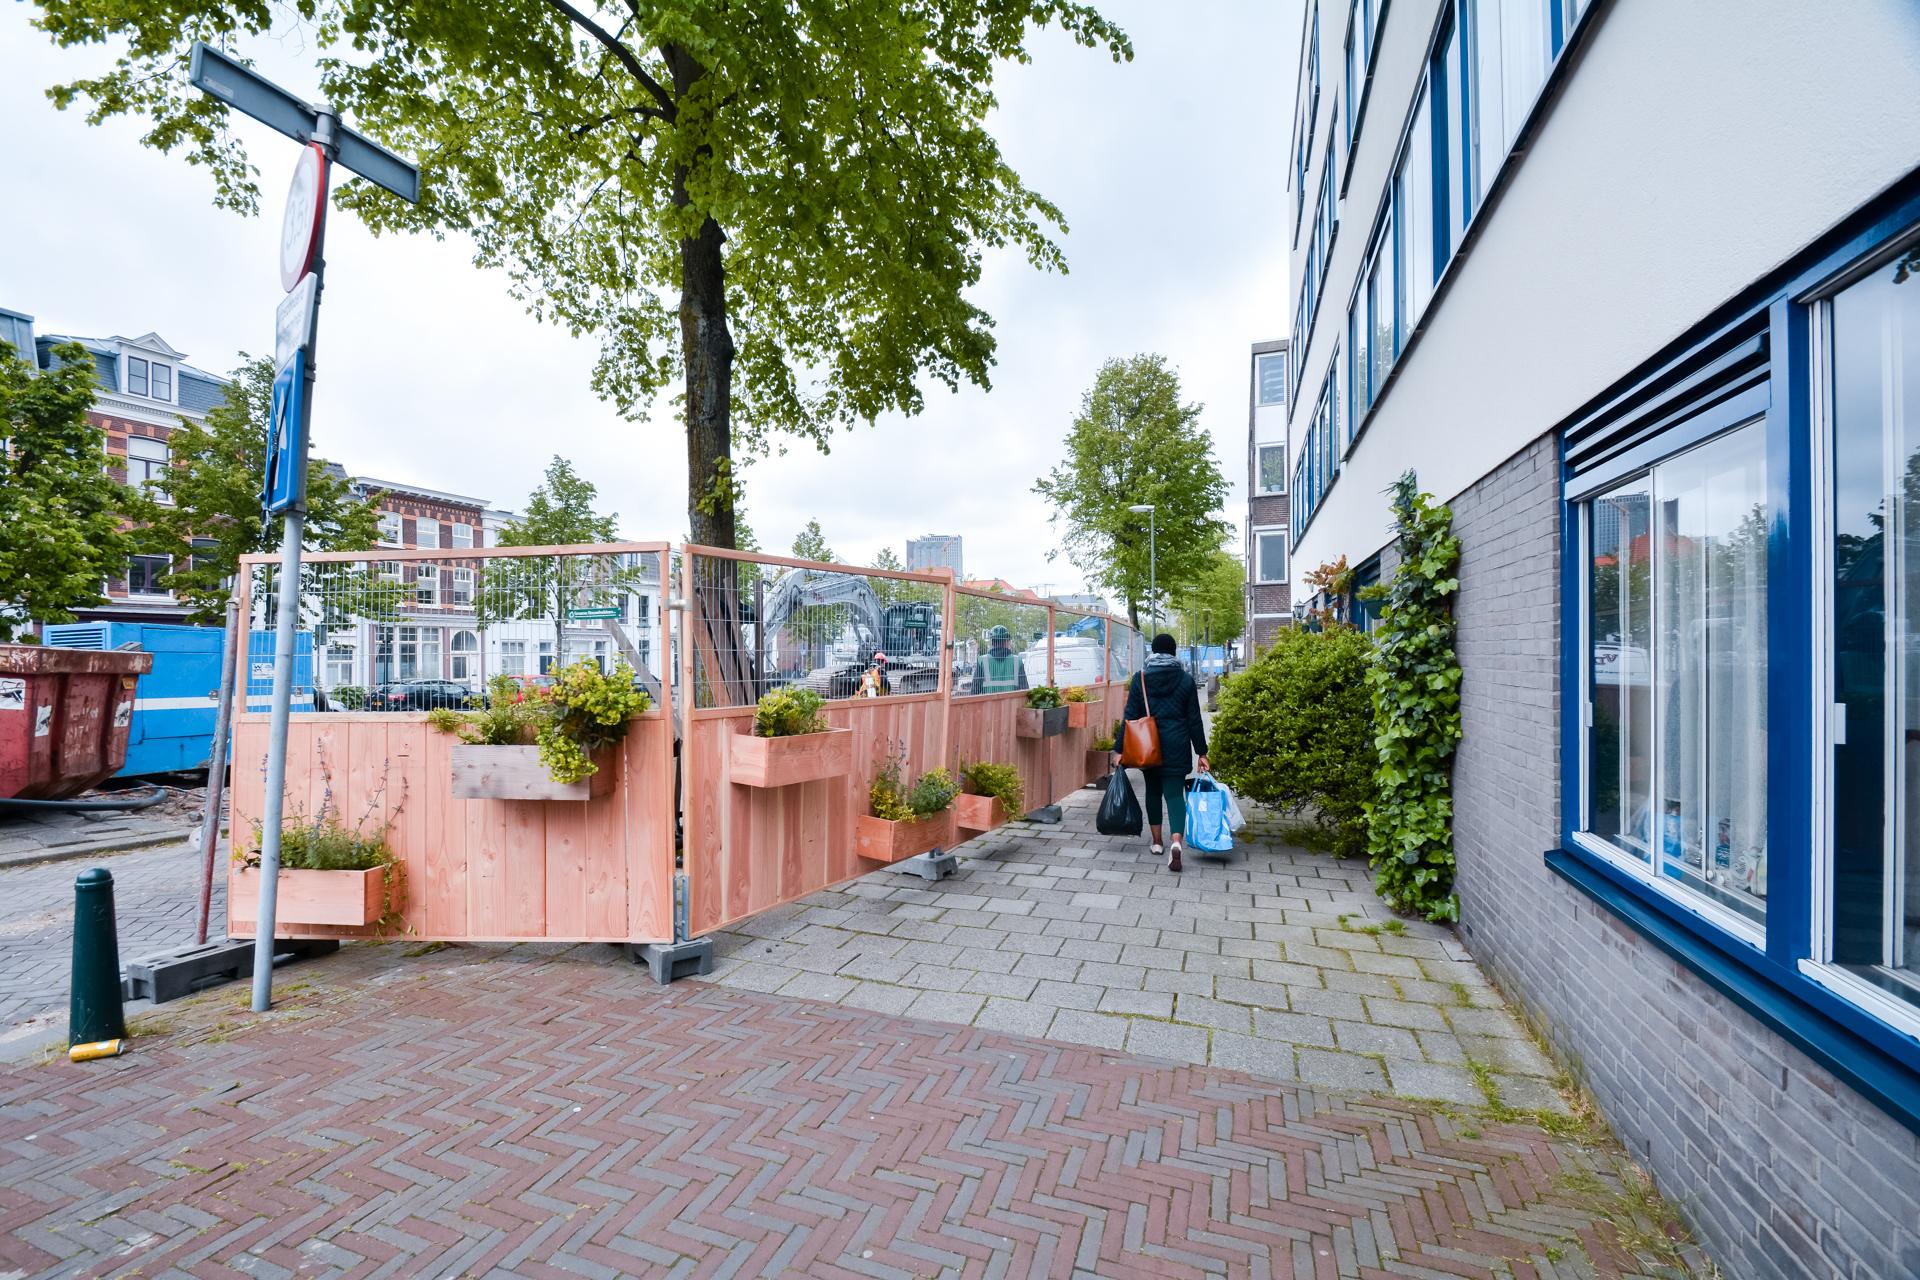 Groene Bouwhekken aan het Groenewegje in Den Haag